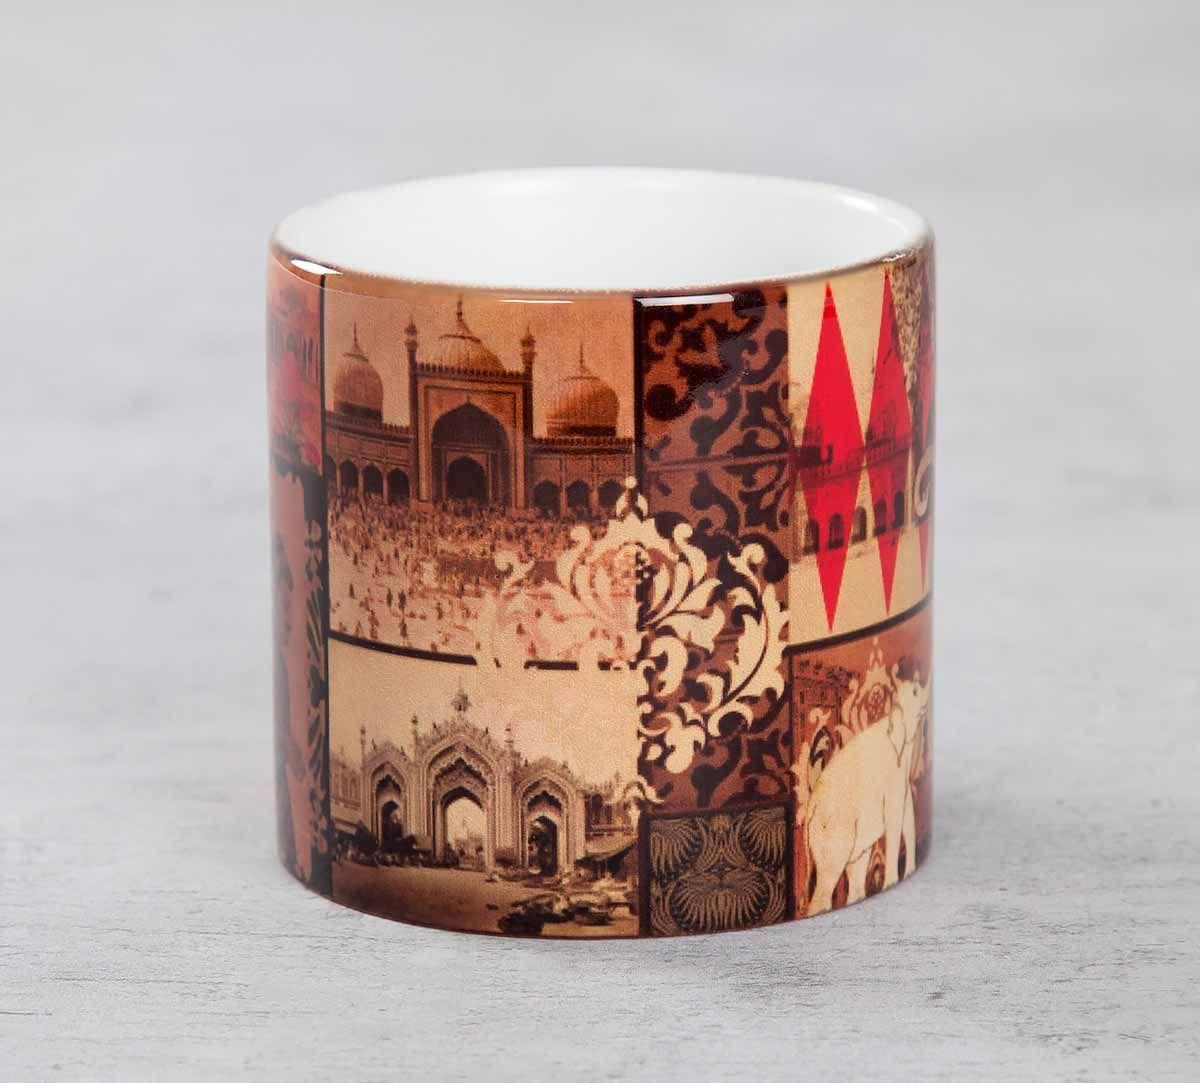 India Circus The Mughal Era Coffee Mug Small